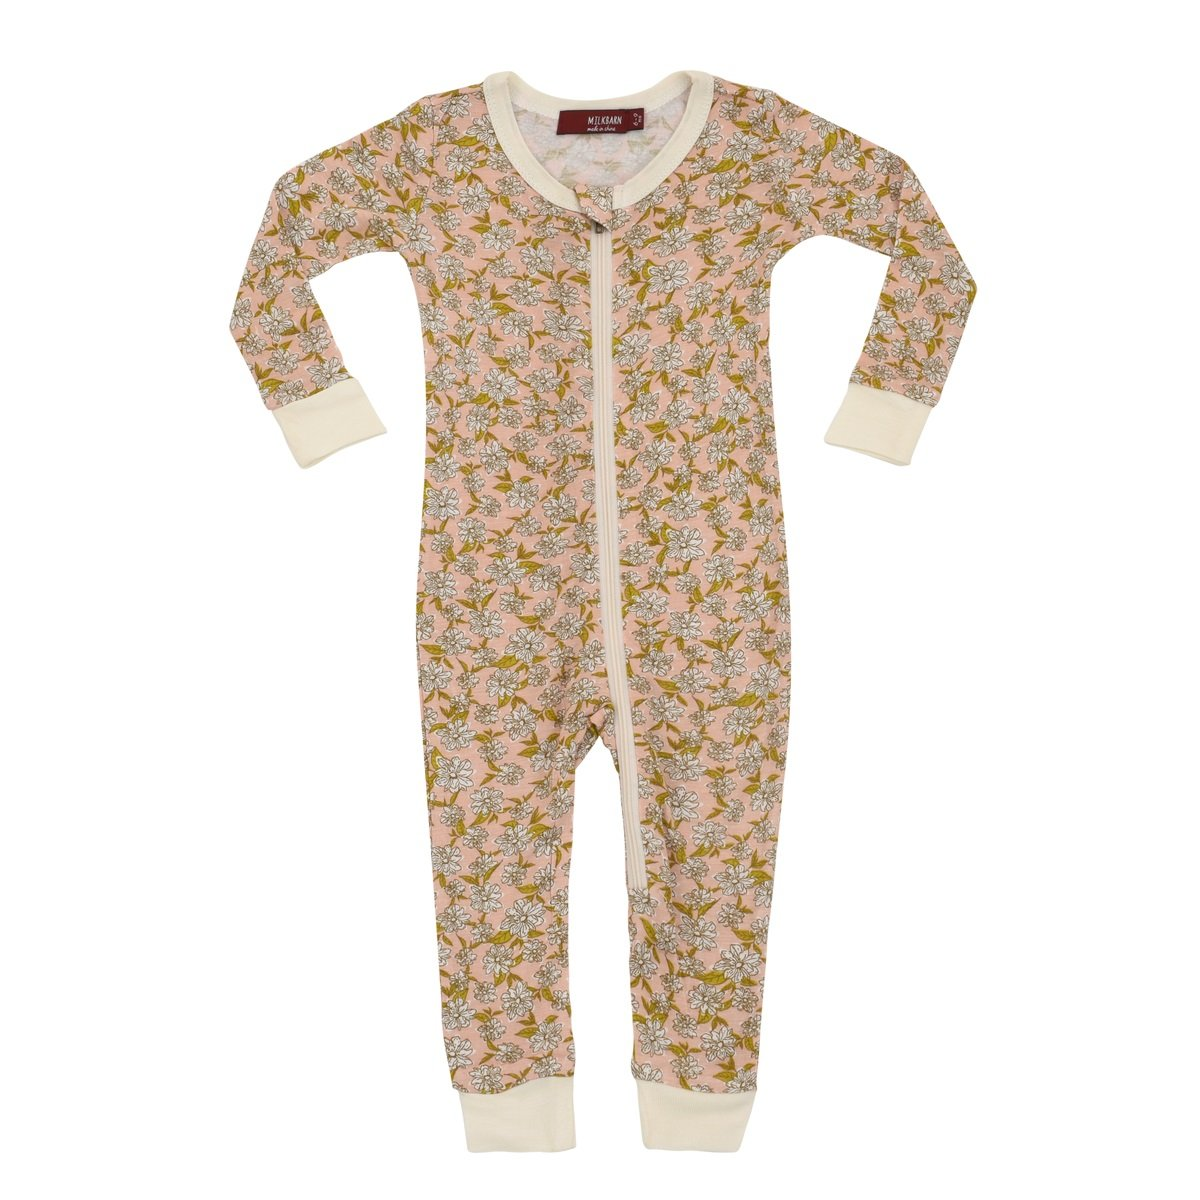 MilkBarn Bamboo Zipper Pajama - Rose Floral (6-9 Month) by MilkBarn